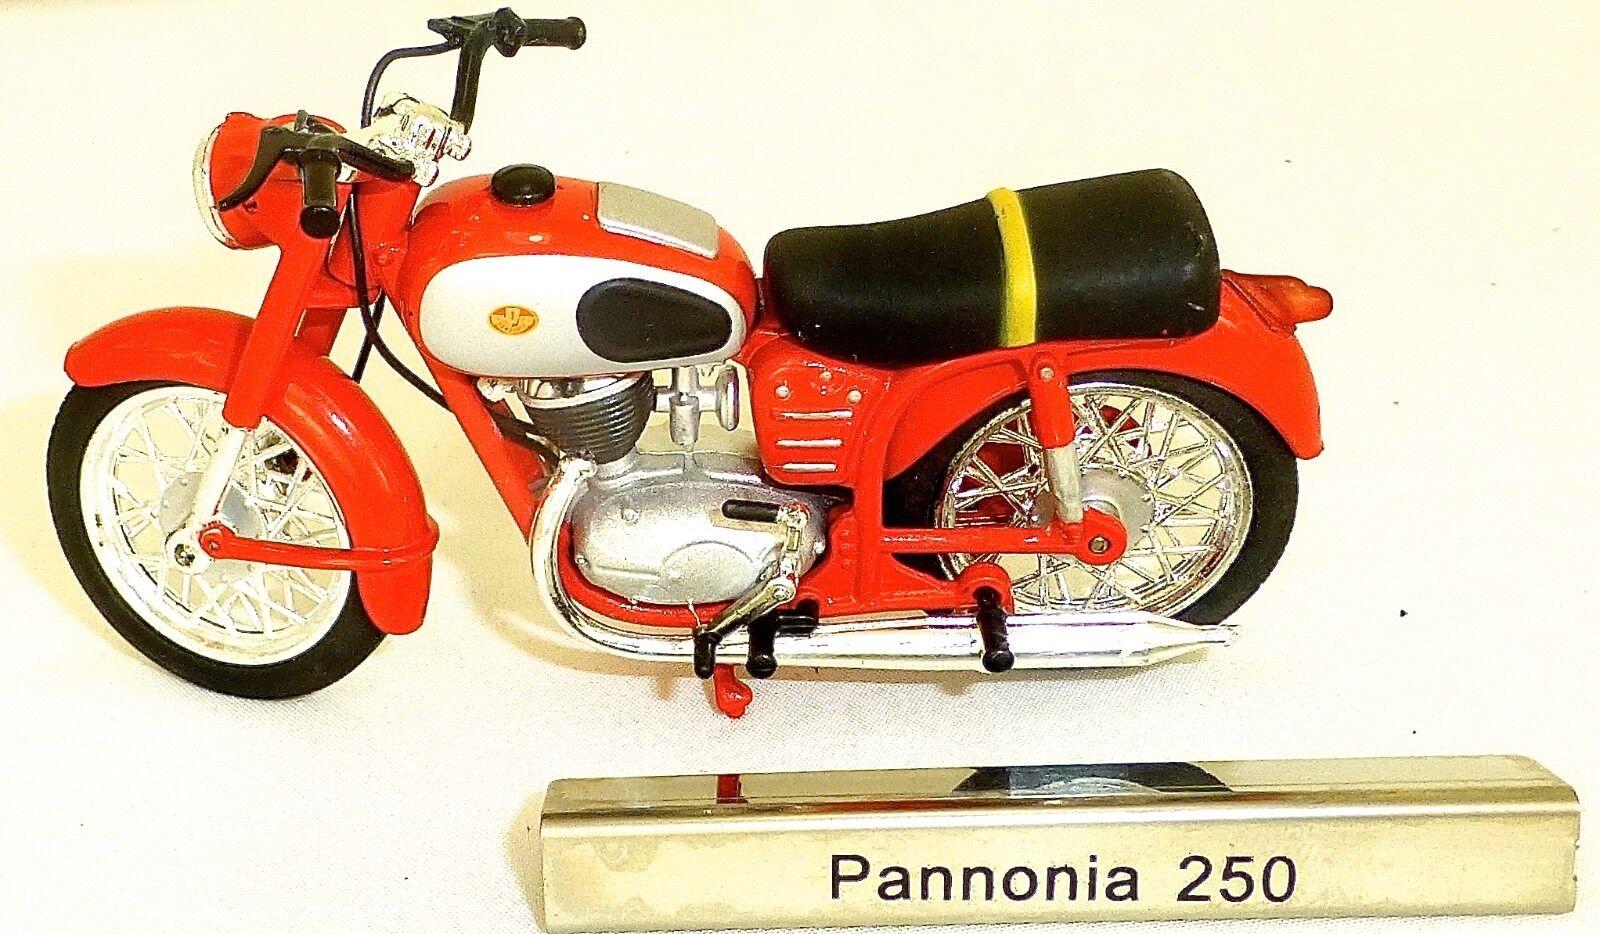 Pannonia 250 Motorcycle Moped GDR 1 24 Atlas 7168109 Nip Μ